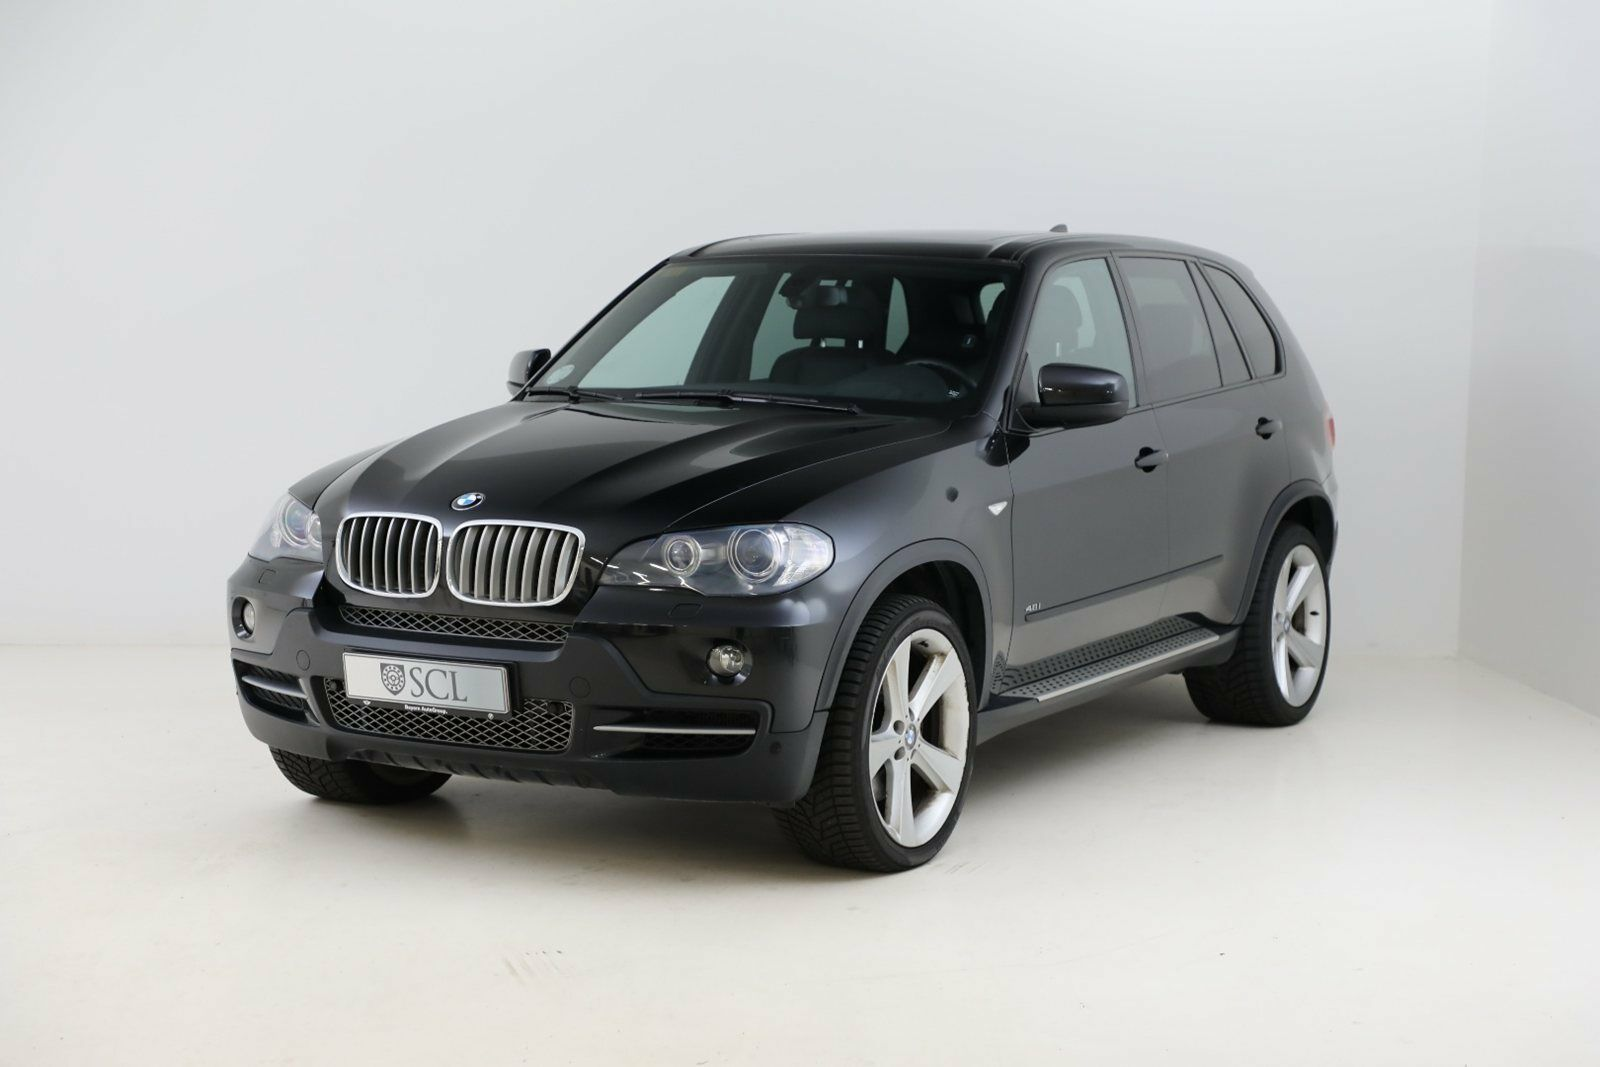 BMW X5 4,8 xDrive48i aut. 7prs 5d - 475.000 kr.